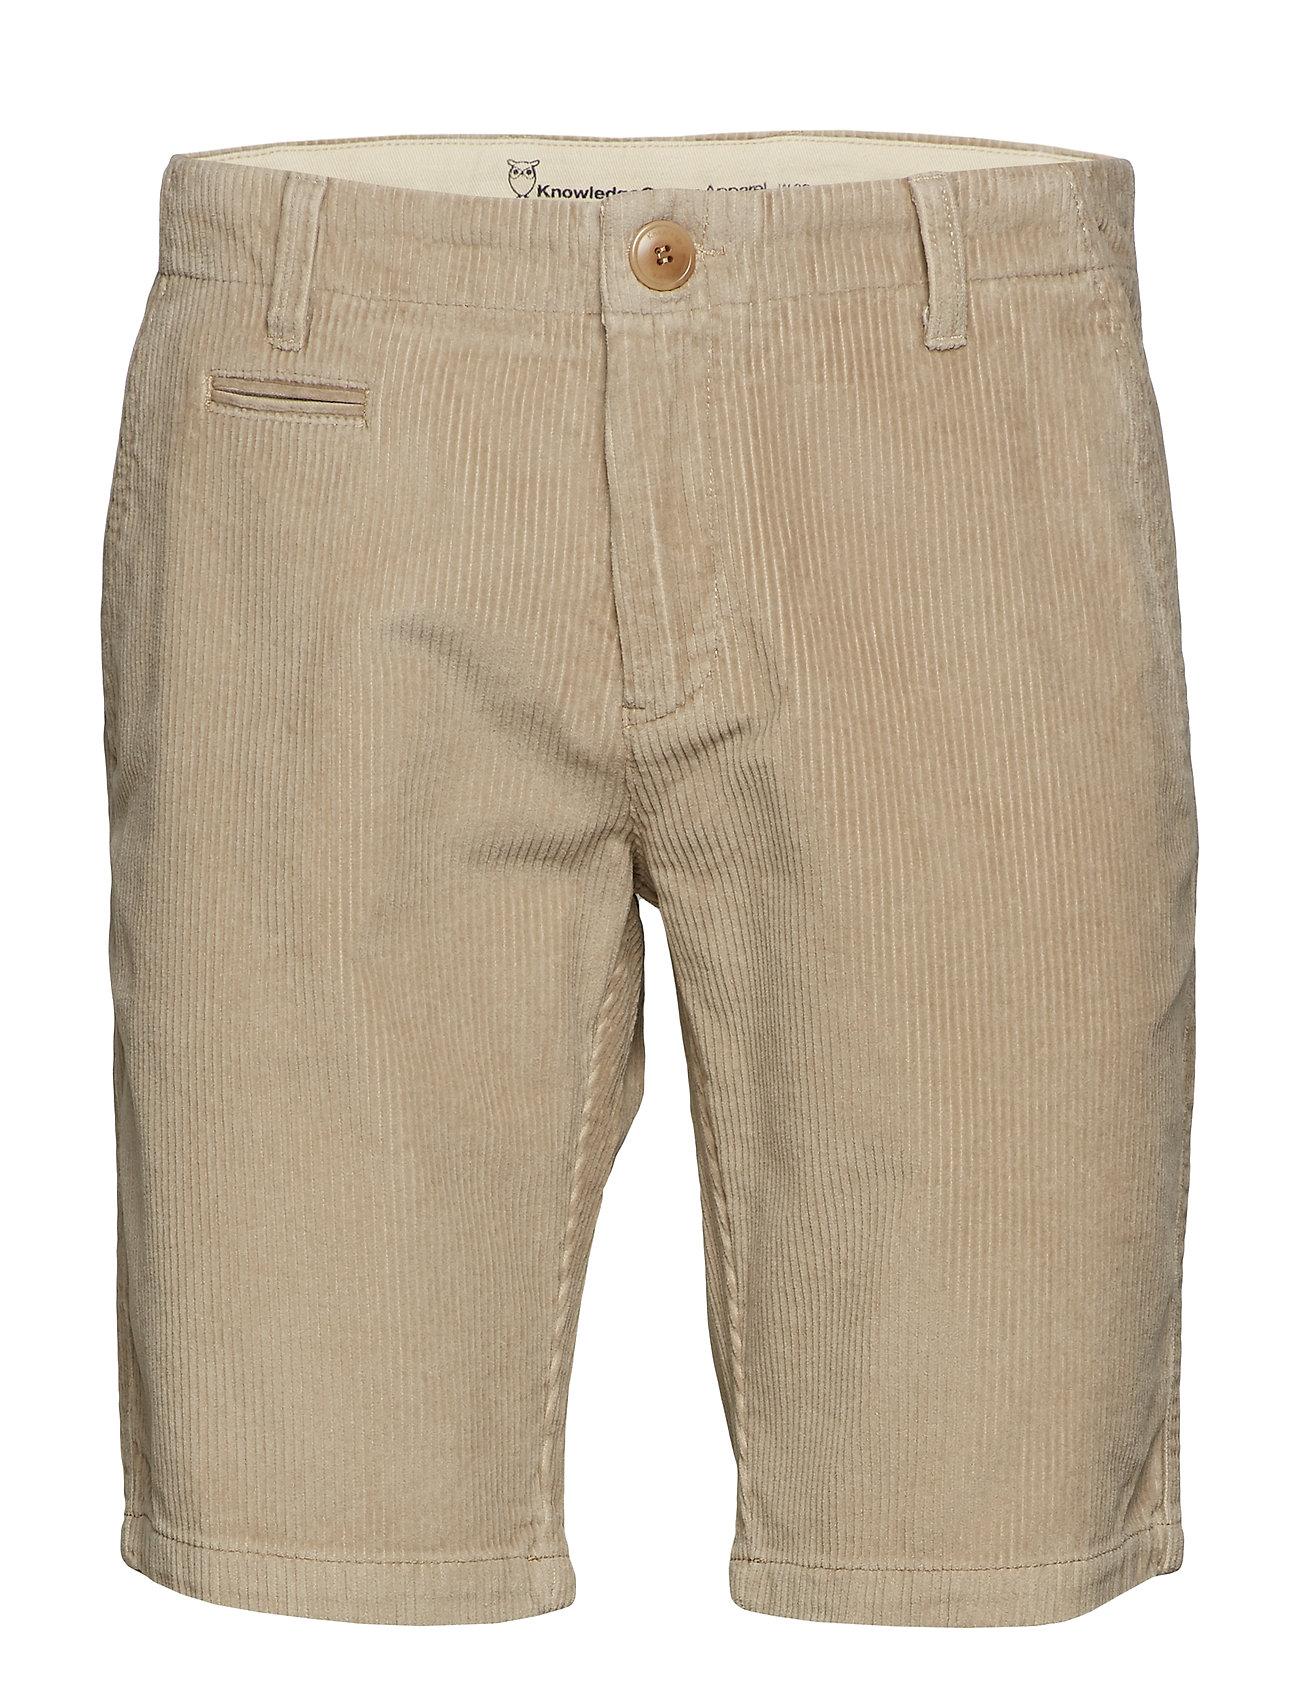 Knowledge Cotton Apparel Cordroy shorts - OCS/Vegan - LIGHT FEATHER GRAY